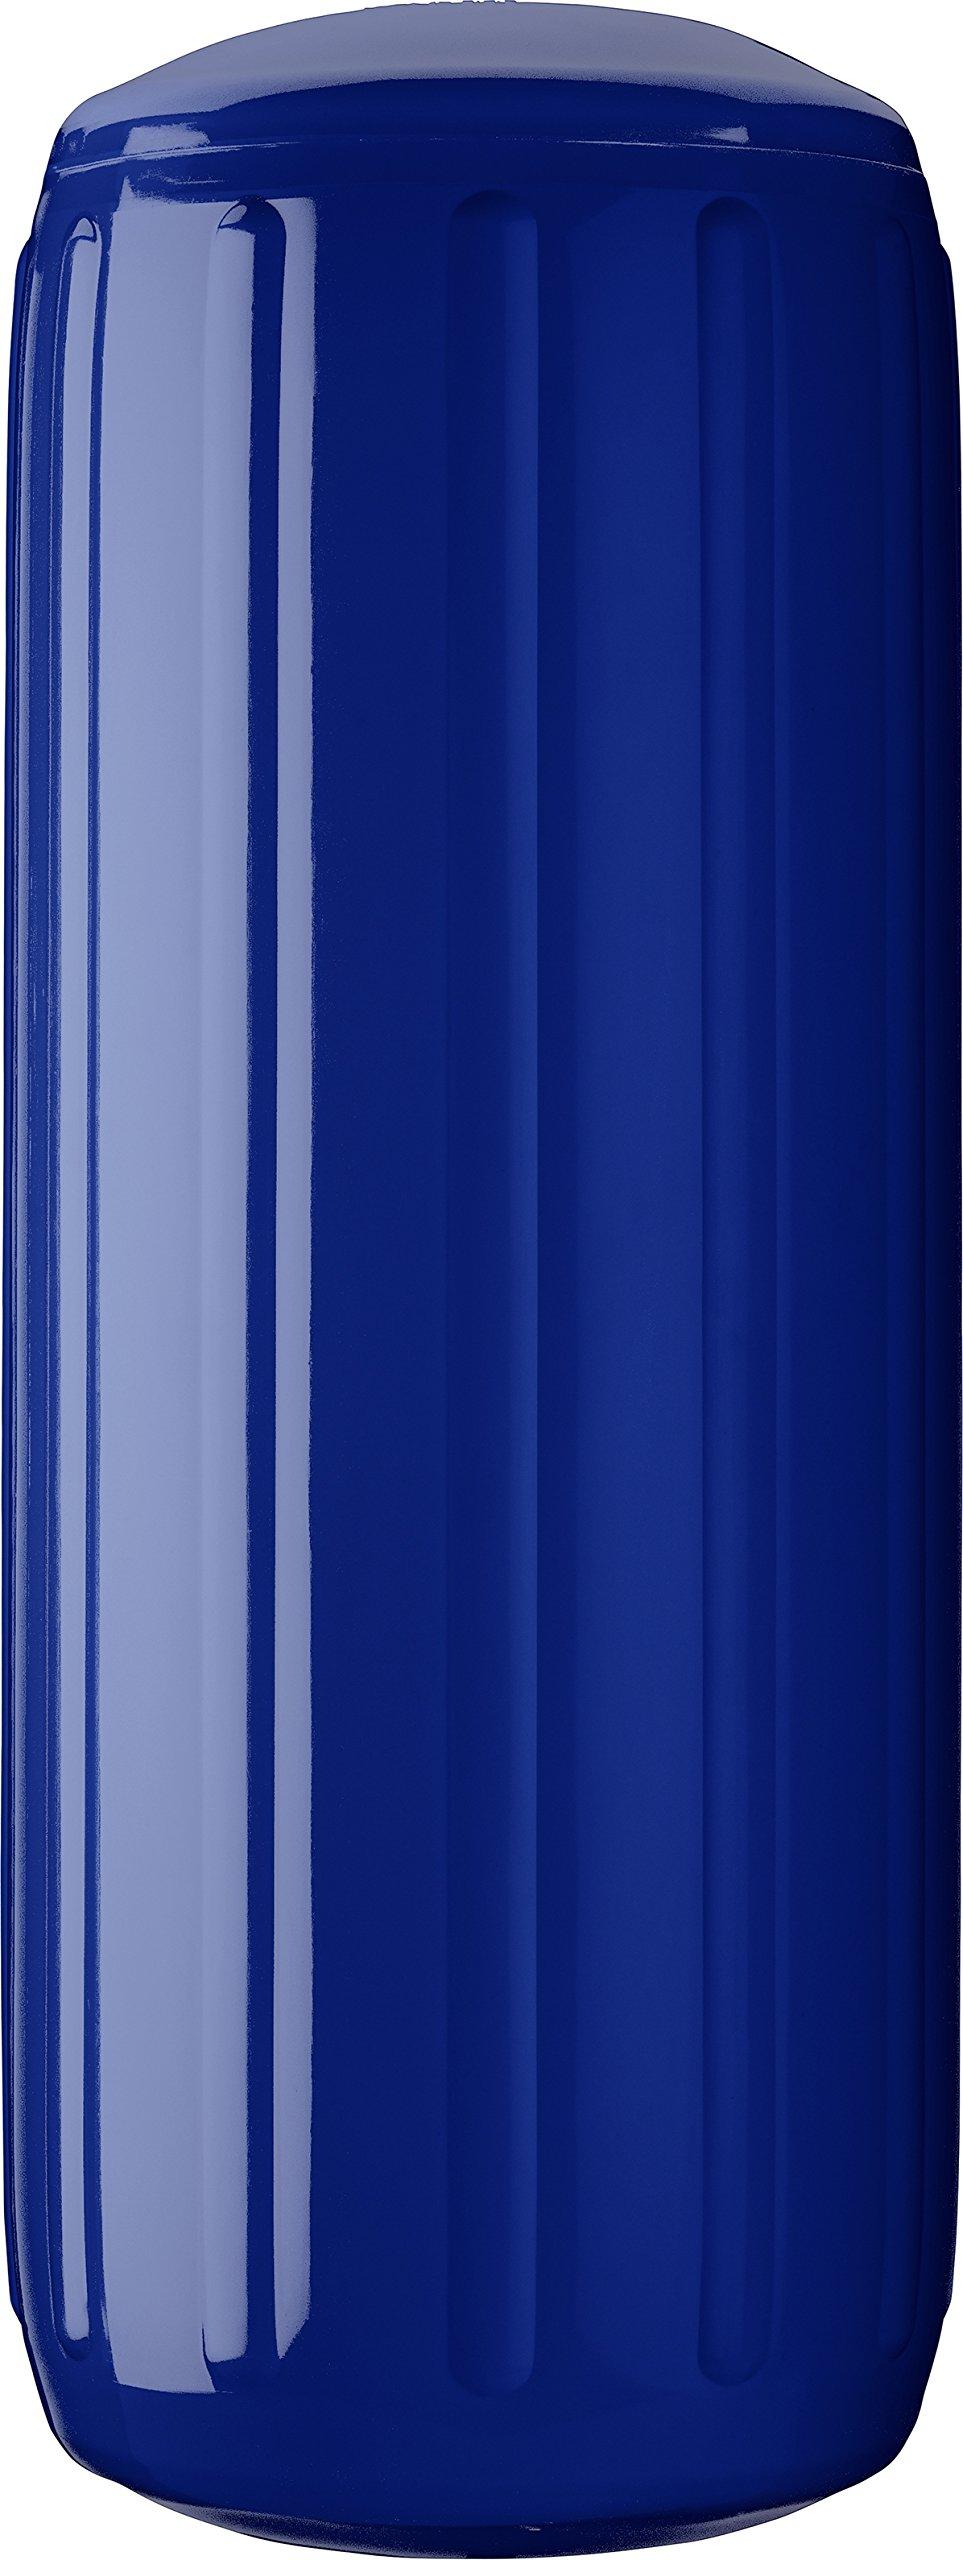 Polyform US HTM-2 (Hole-Through-Middle) Fender, Cobalt Blue (8.5 x 20.5-Inch)